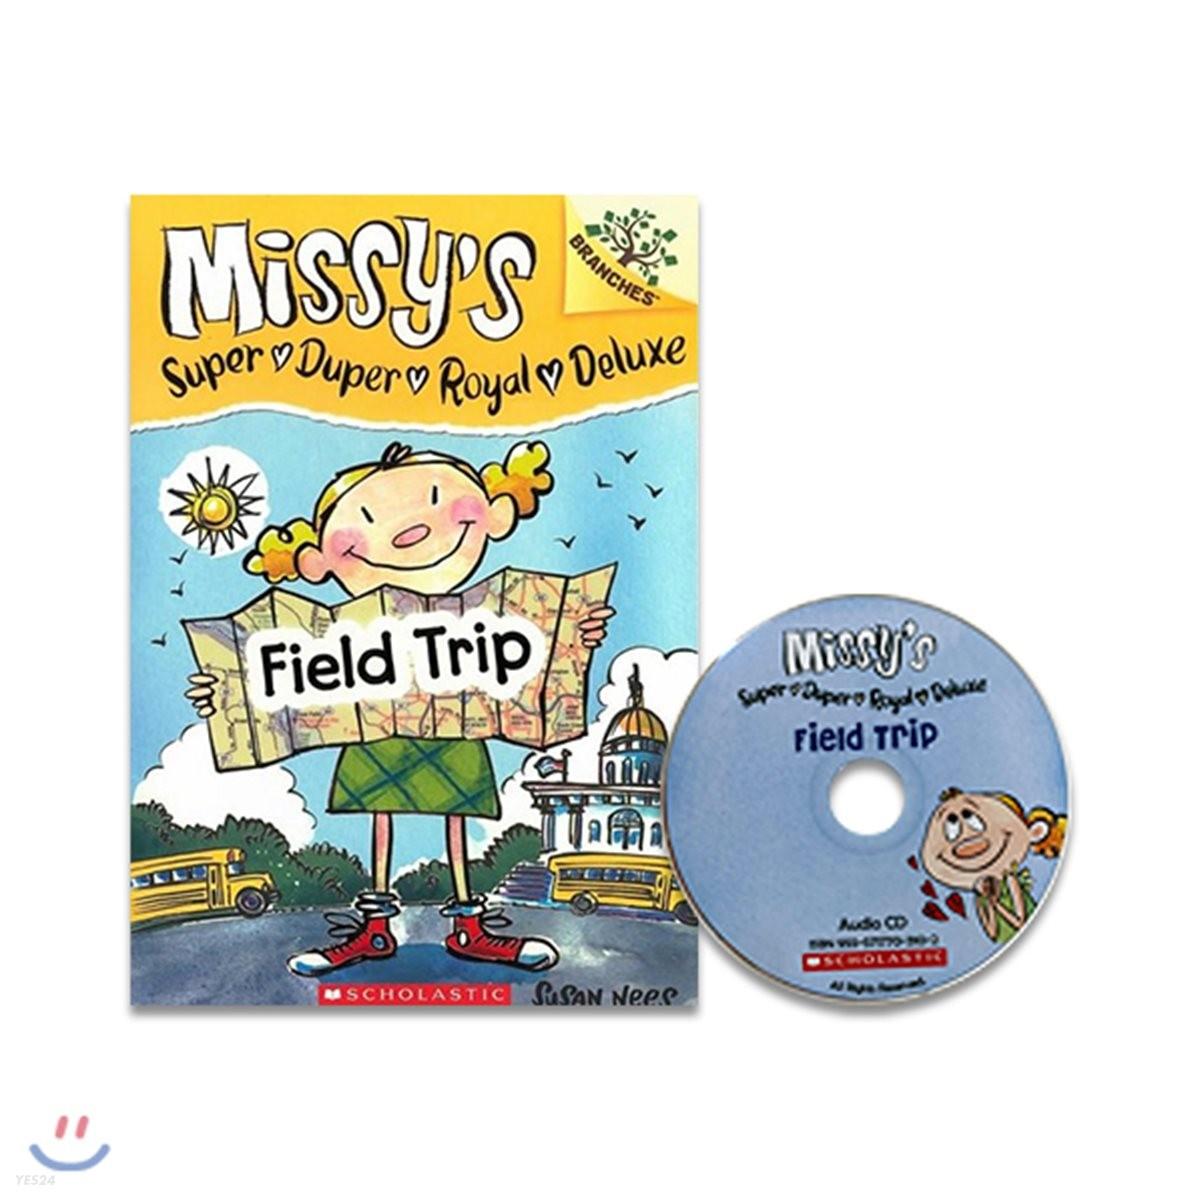 Missy's Super Duper Royal Deluxe #4 : Field Trip